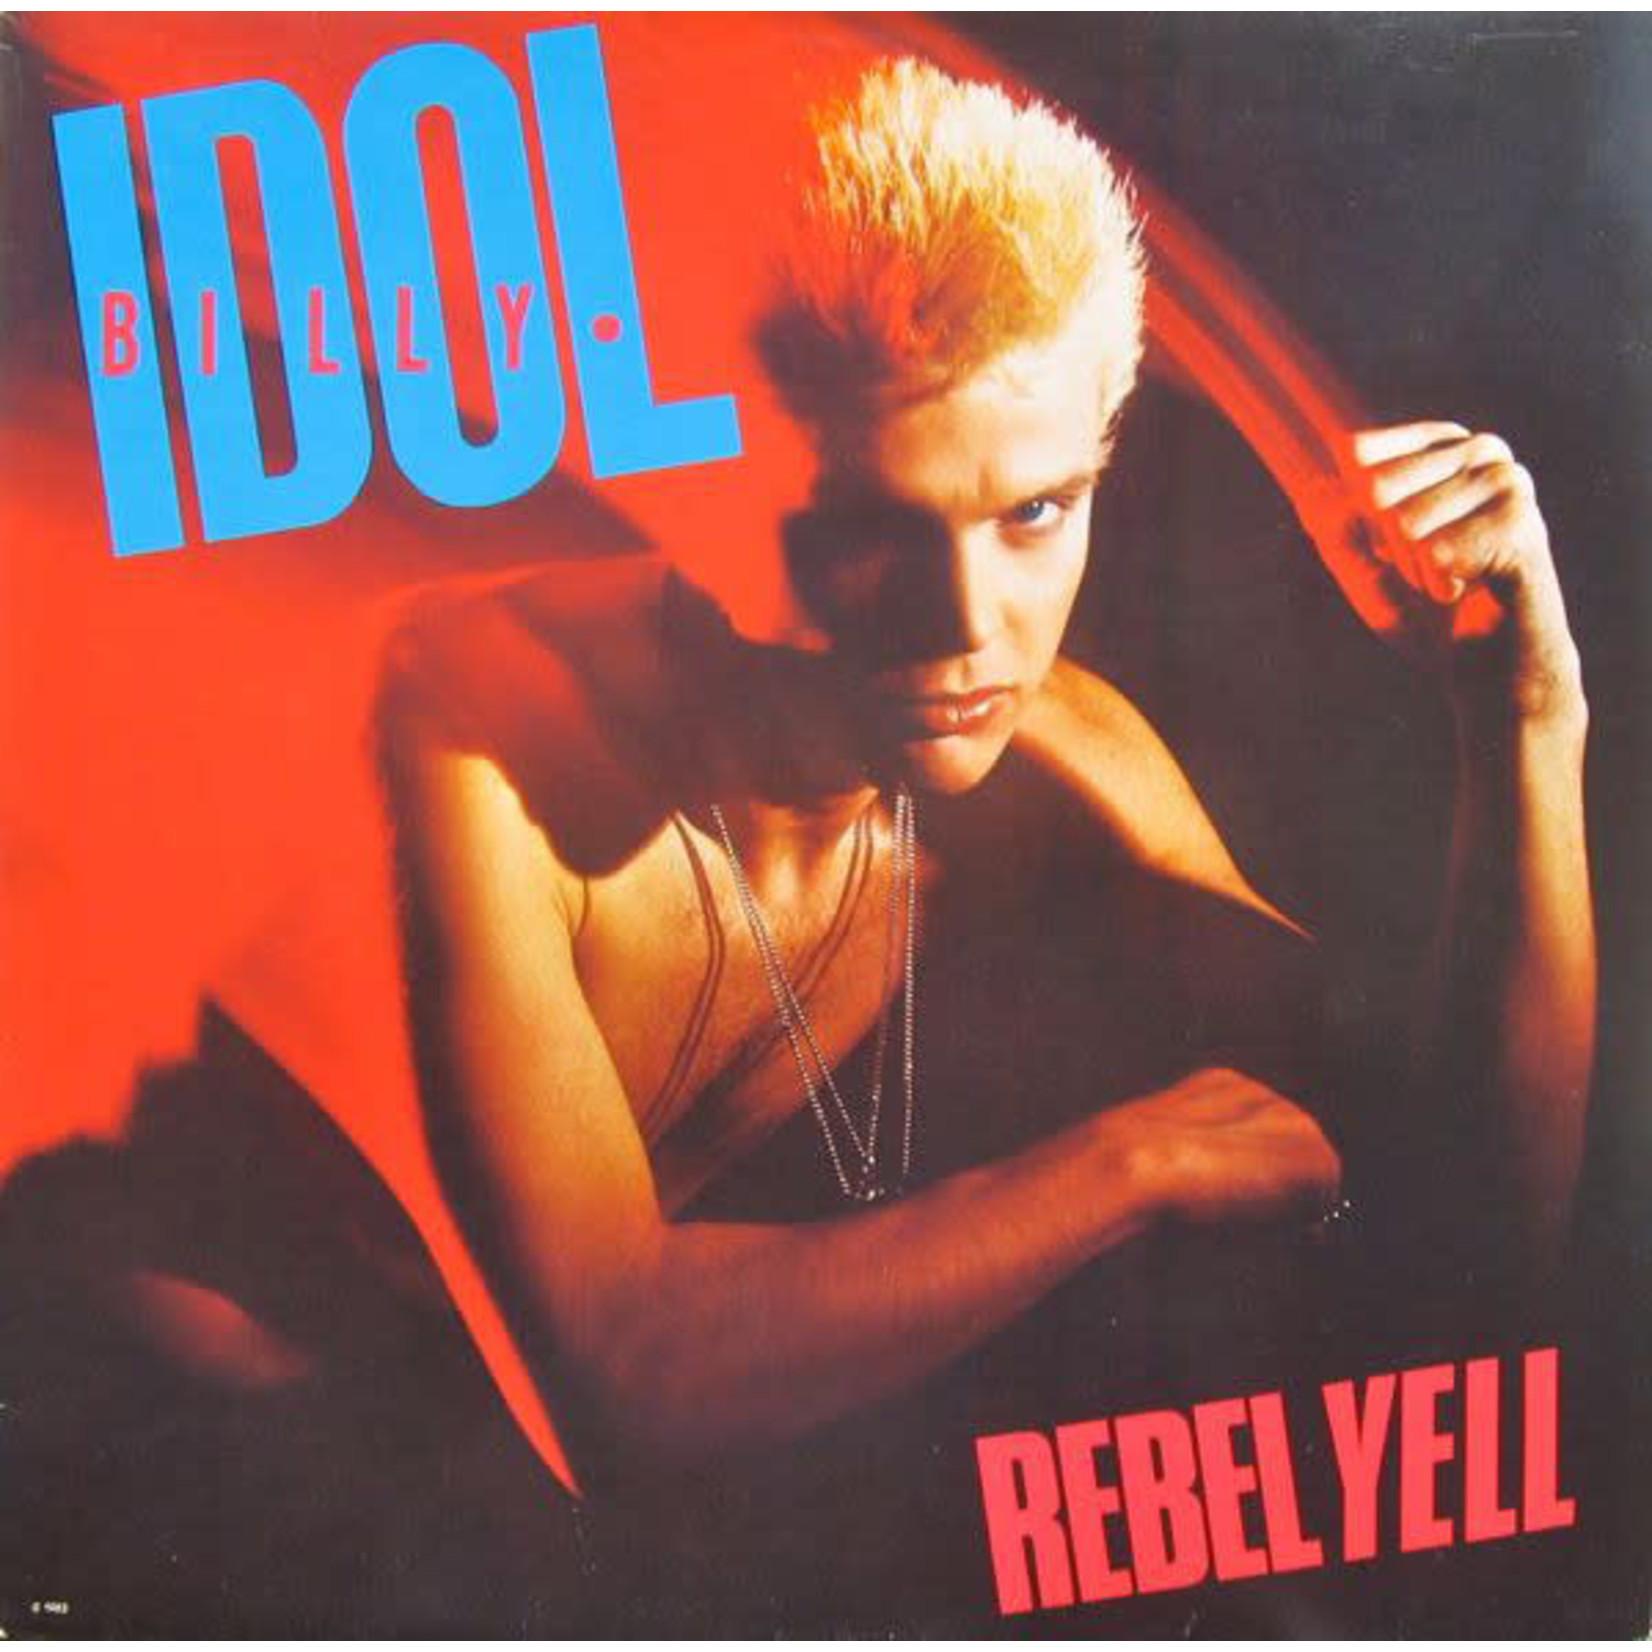 [Vintage] Idol, Billy: Rebel Yell